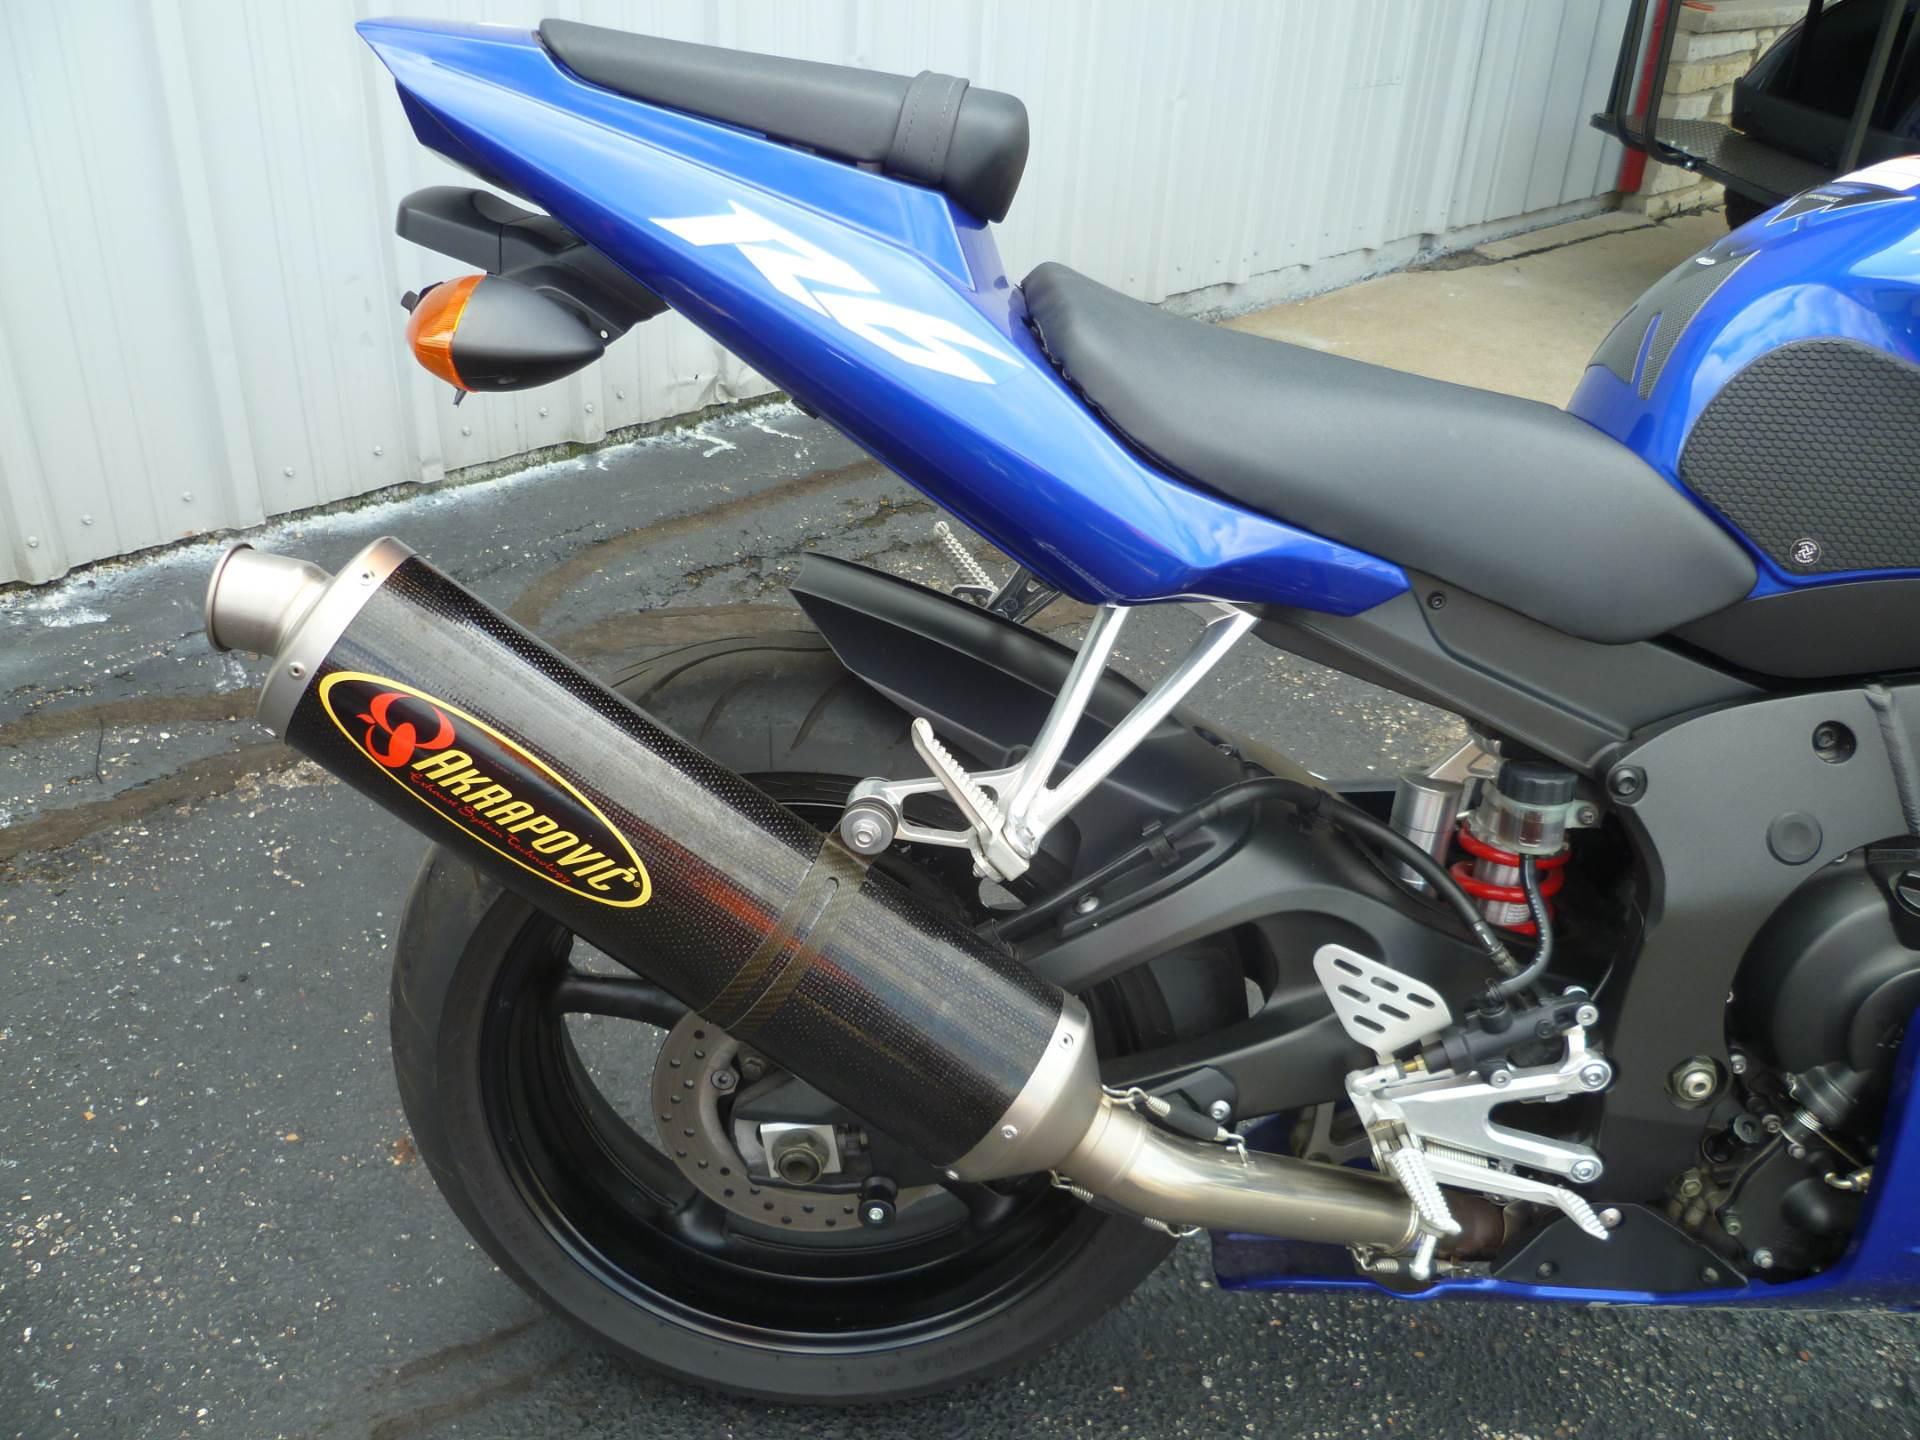 2004 Yamaha YZF-R6 4